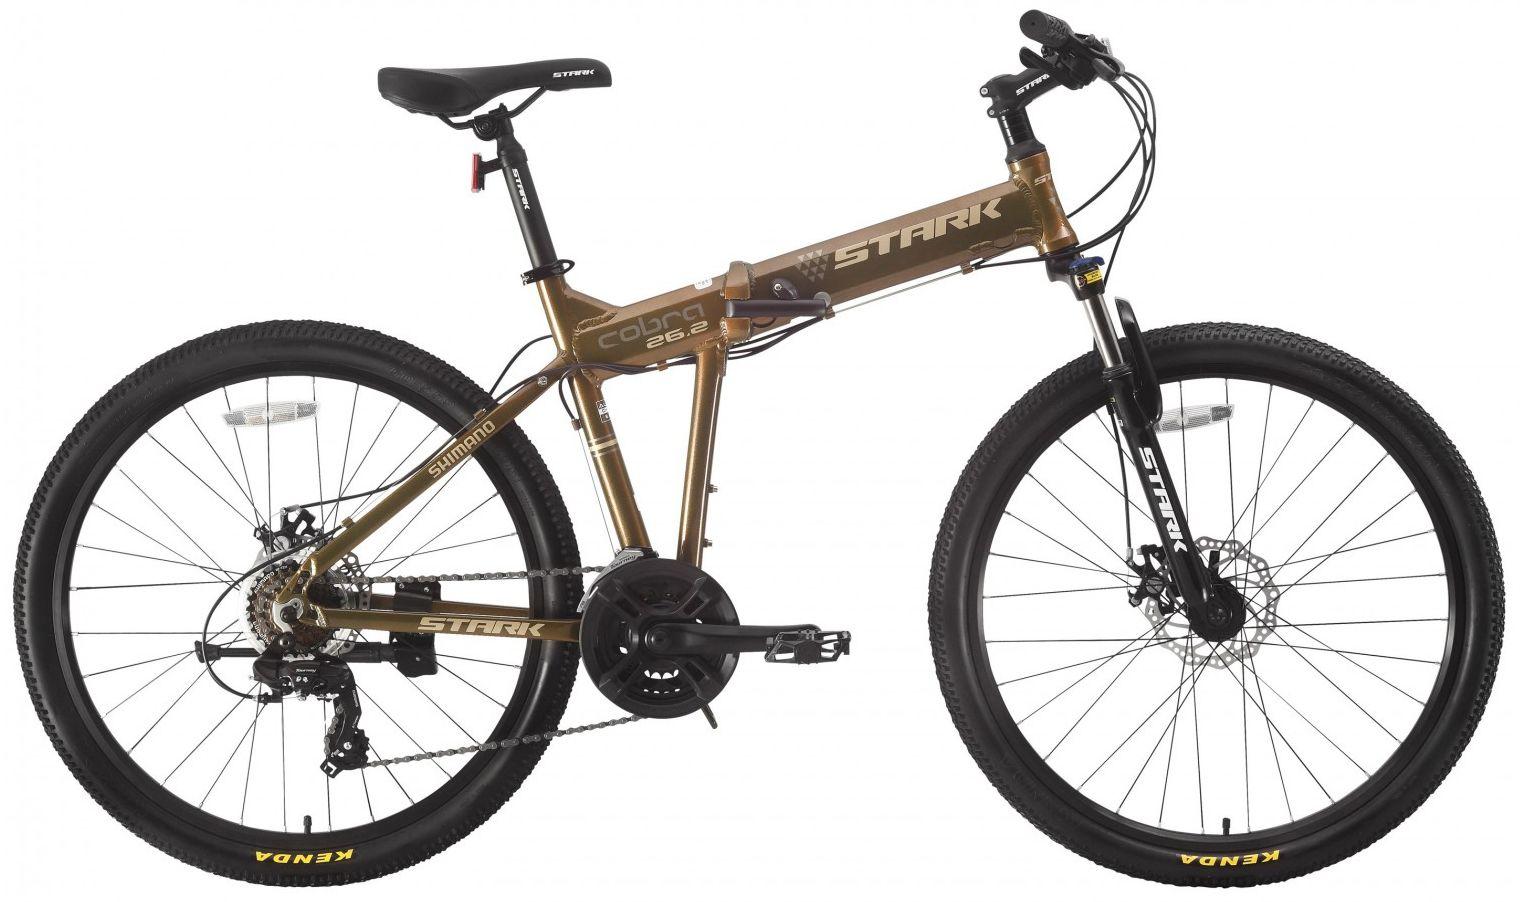 Велосипед Stark Cobra 26.2 D 2017,  Складные  - артикул:275618